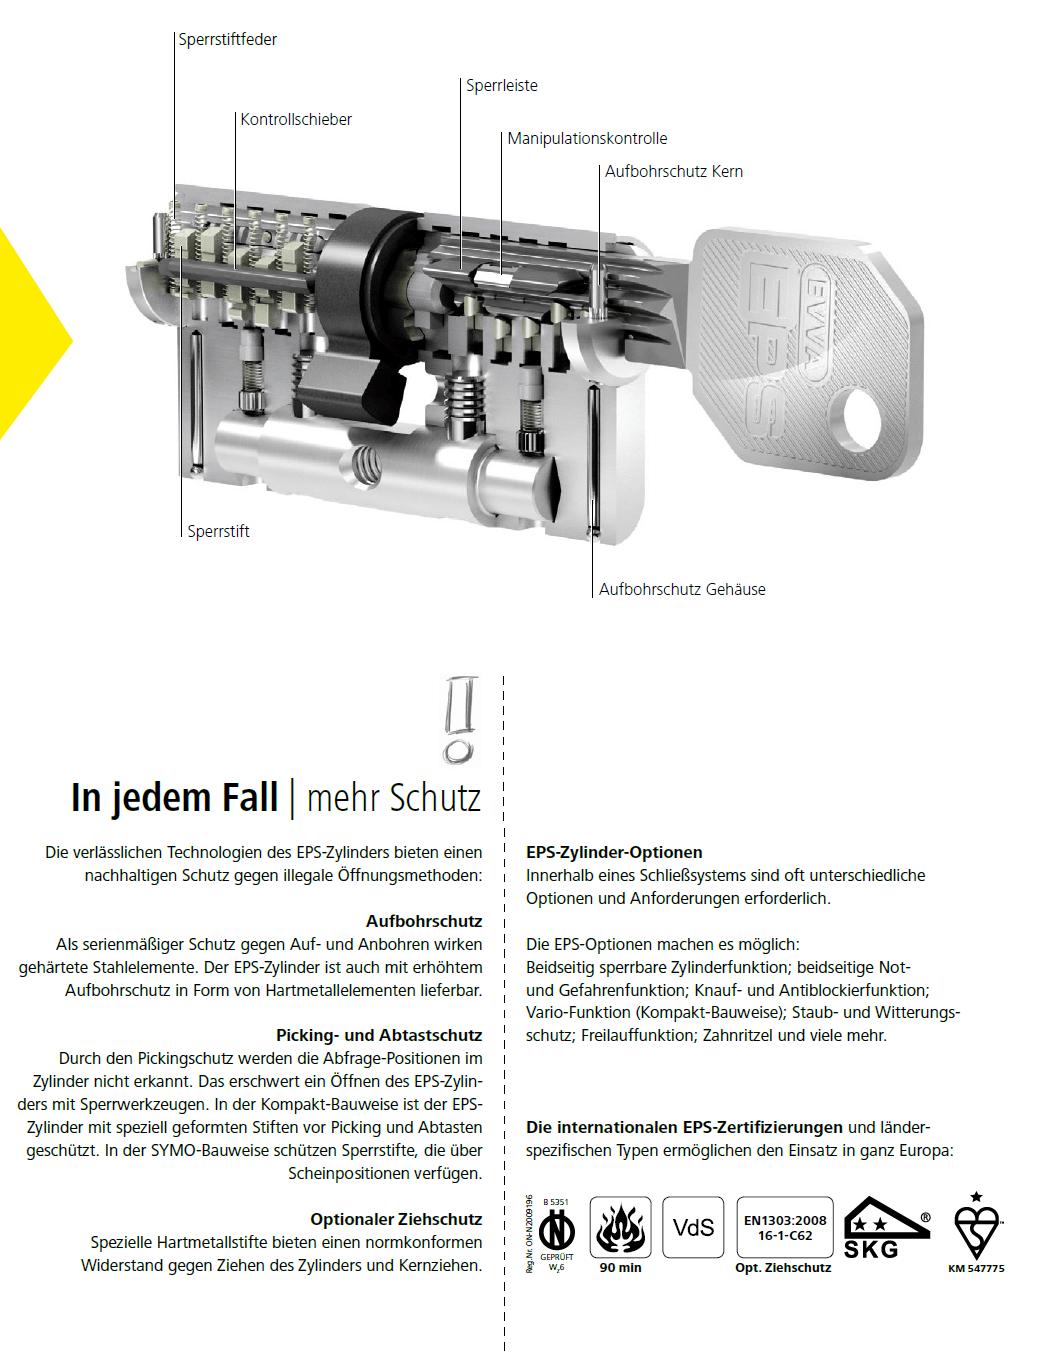 https://res.cloudinary.com/digitalzylinder-shop/dpr_auto,e_auto_color,f_auto,q_auto/product_images/evva-mechanisch/evva-eps-vorhangschloss-hpm-mit-2-schluessel-4.png